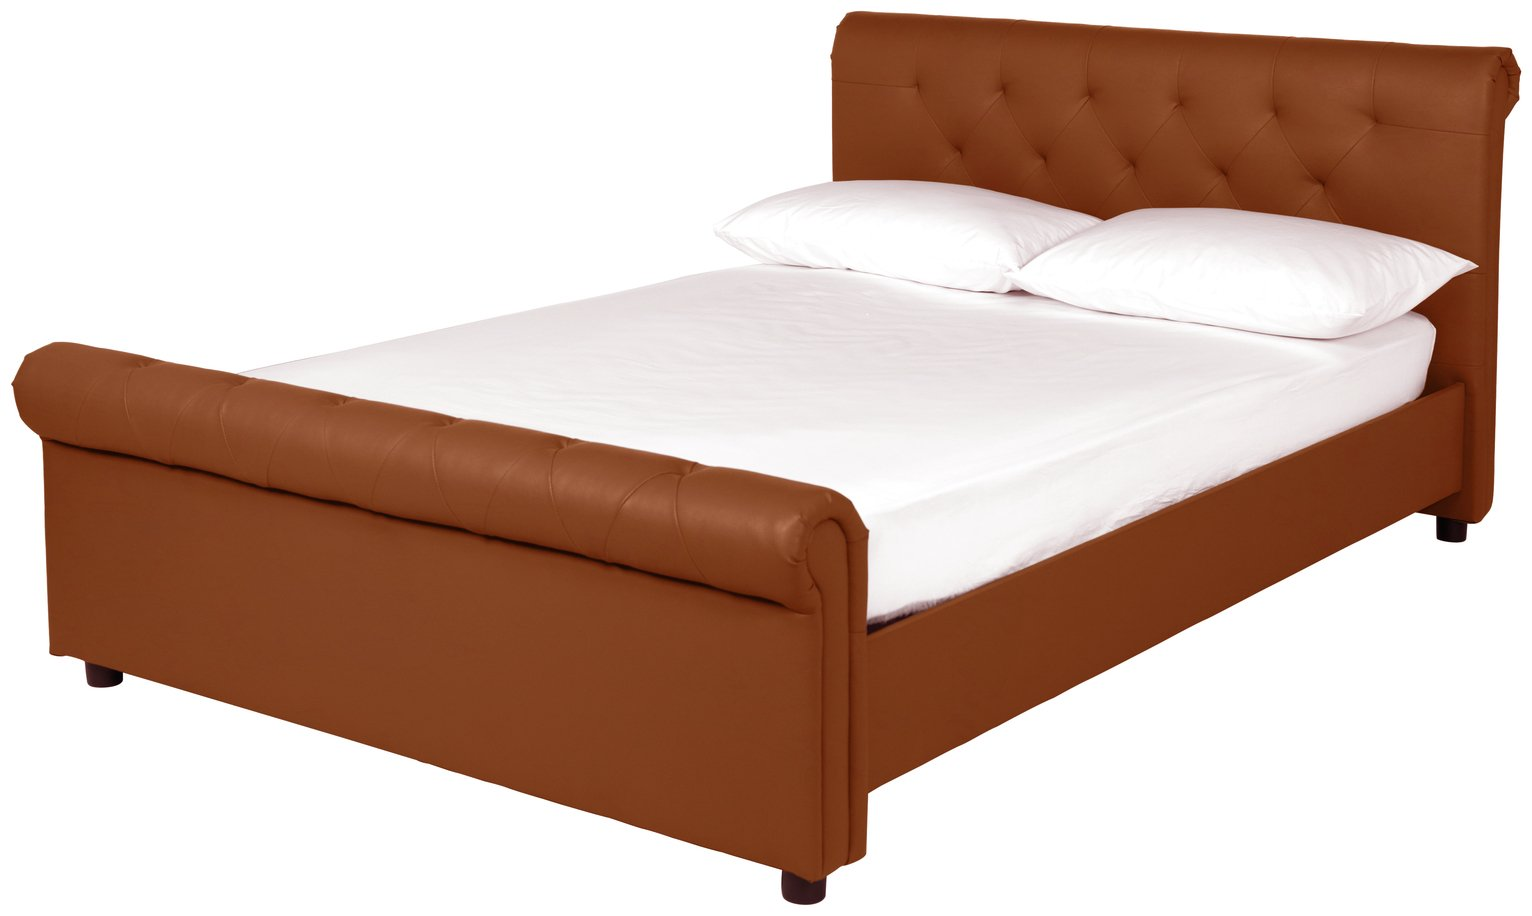 Argos Home Hayford Tan Kingsize Bed Frame